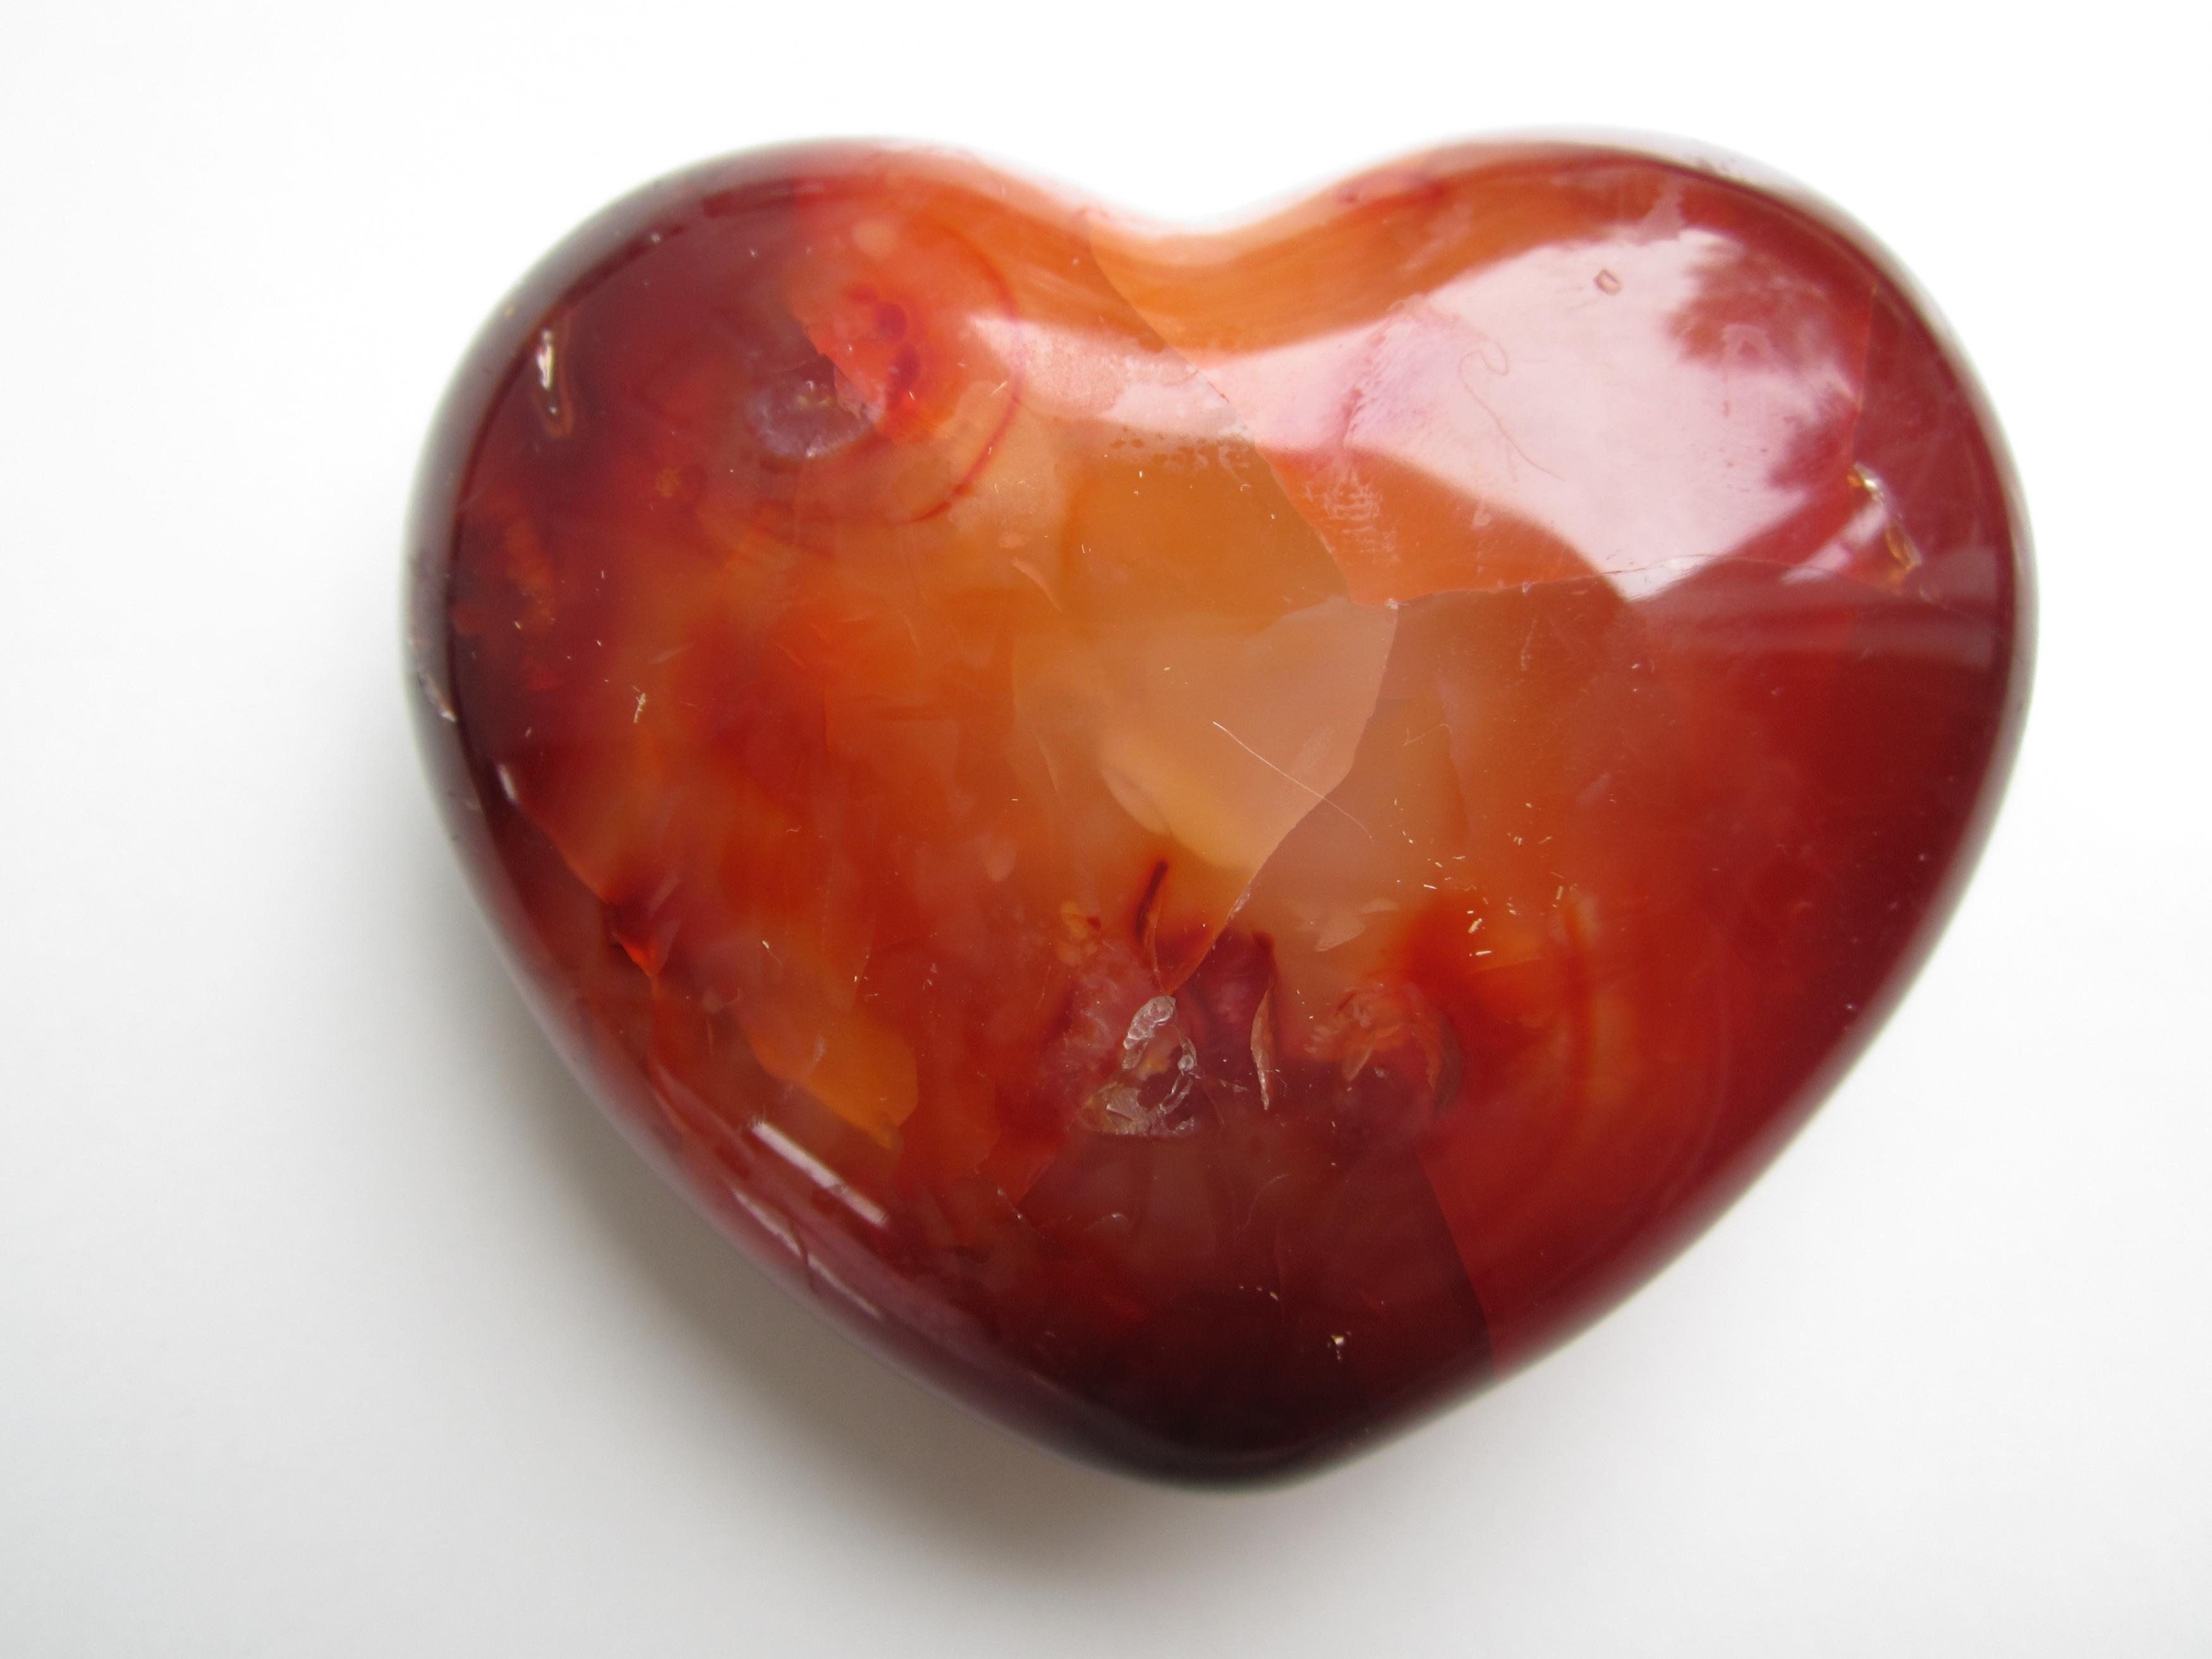 http://www.crystalheartpsychics.com/wp-content/uploads/2016/11/carnelian-crystal-heart.jpg